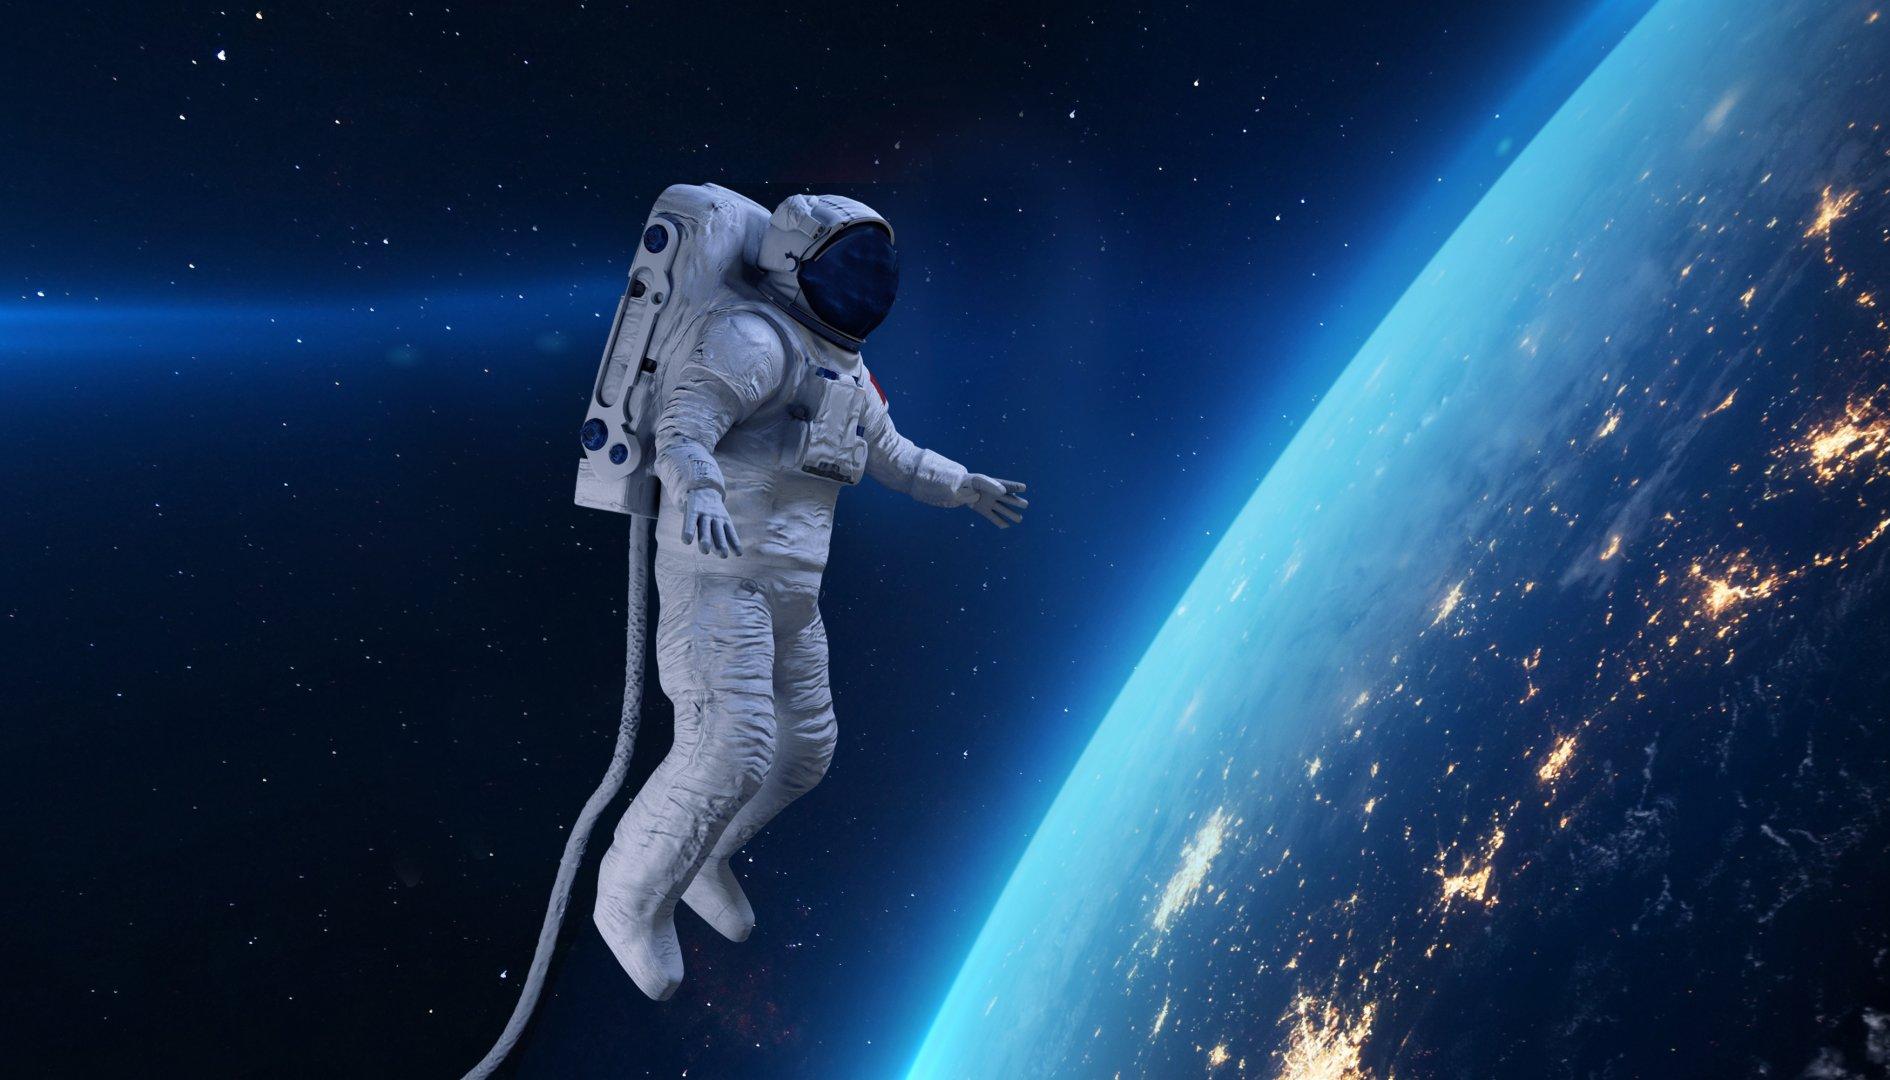 Lovepik_com-500857851-a-floating-astronaut.jpg